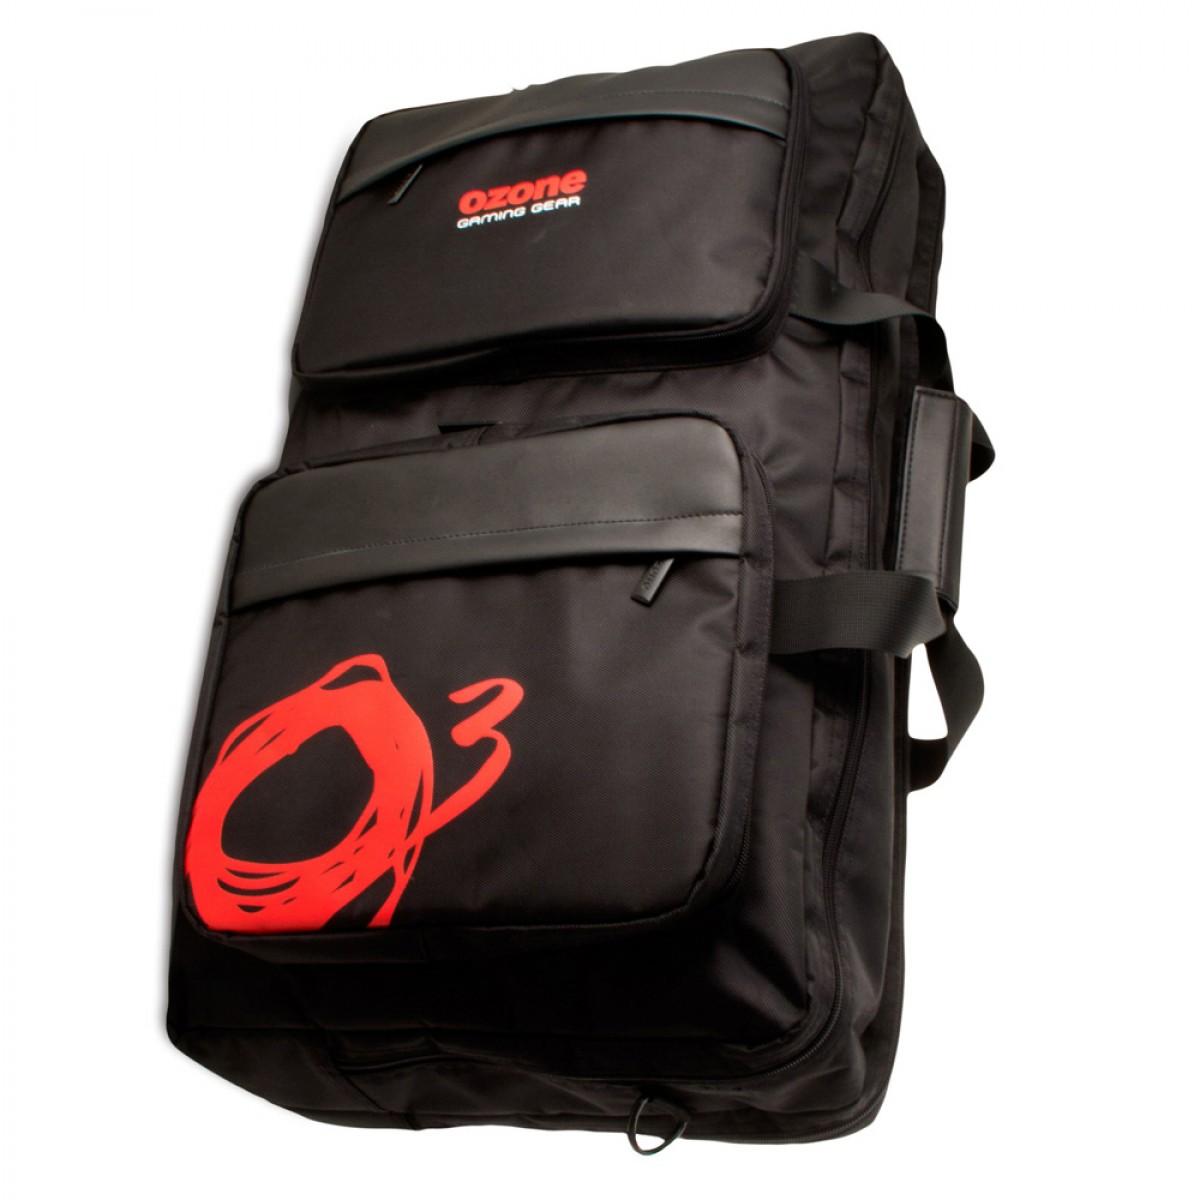 Ozone Lanpck Backpack for 17'' Laptop